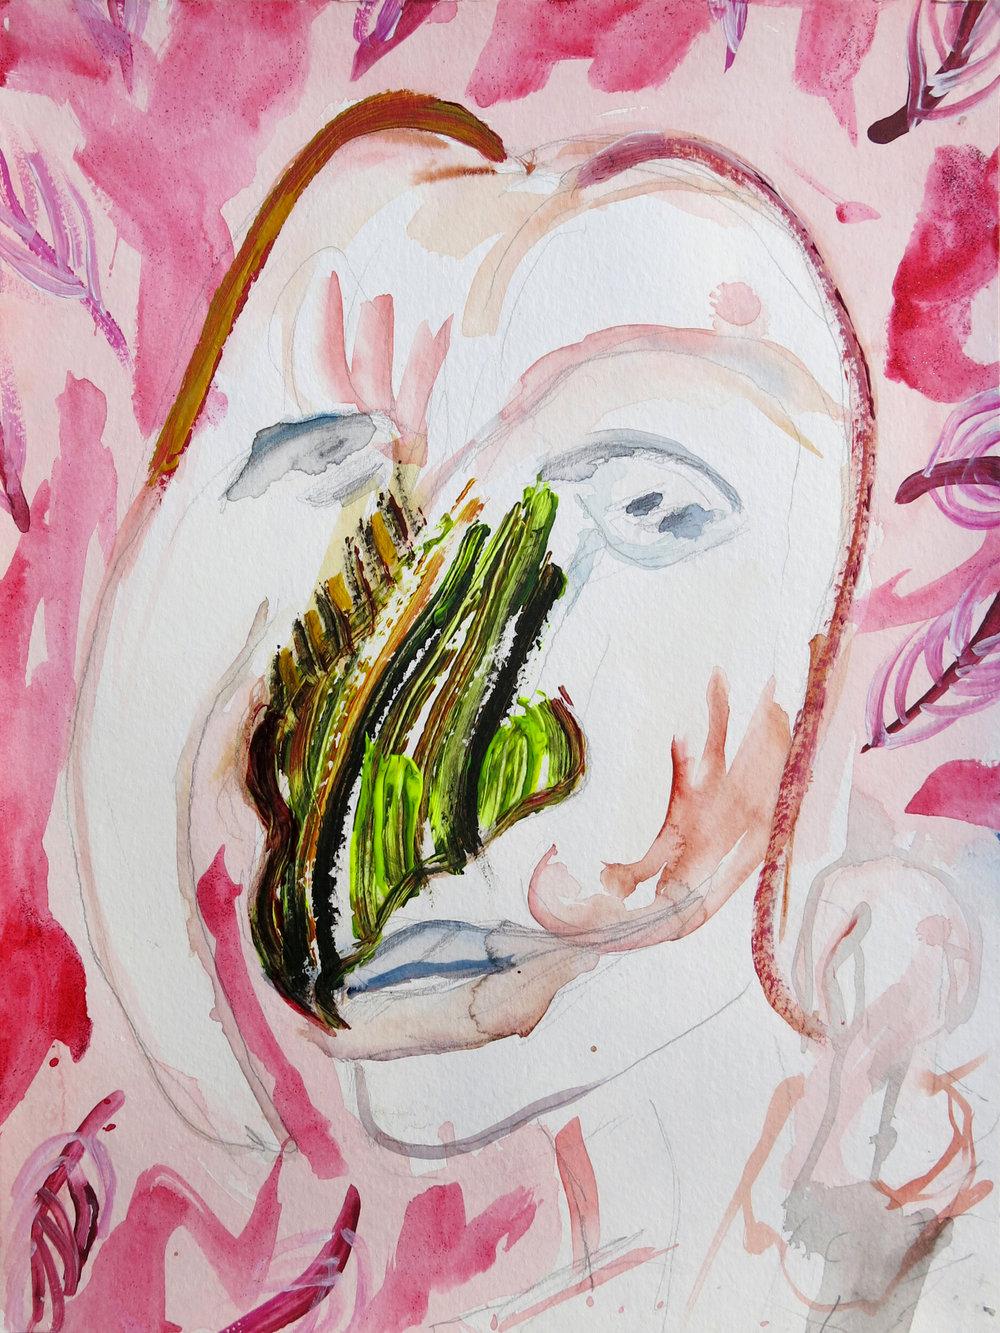 Barbra Streisand Portrait #62